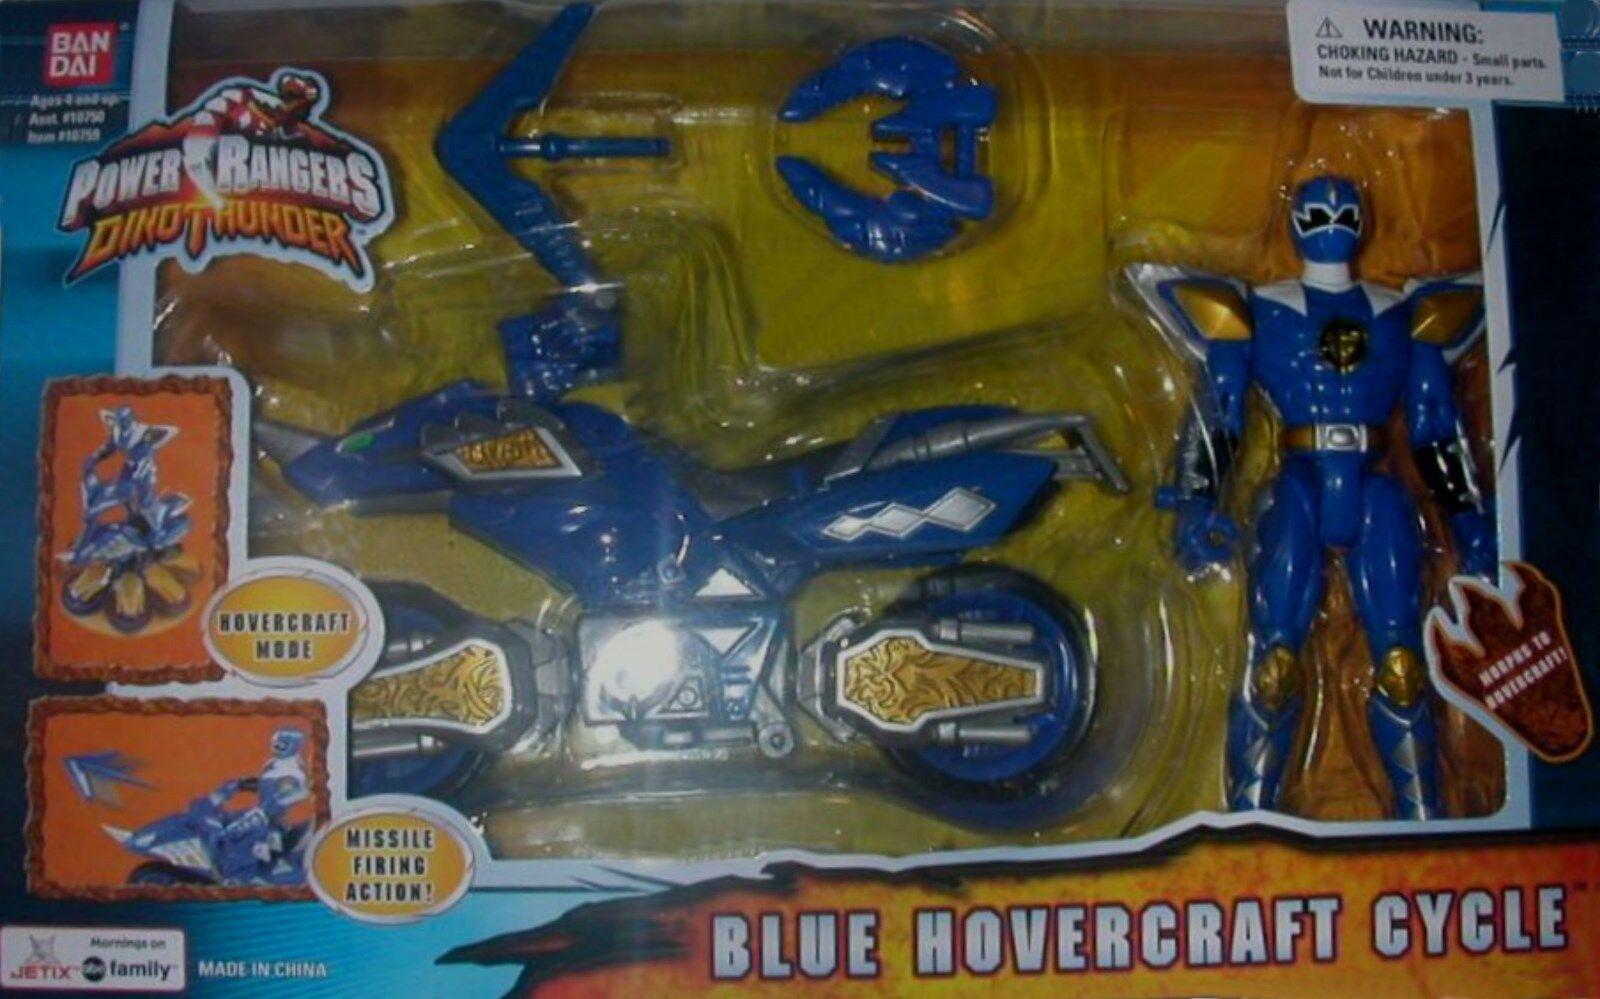 Power rangers dino donner blaue hovercraft - zyklus ranger neue fabrik versiegelt, 2004